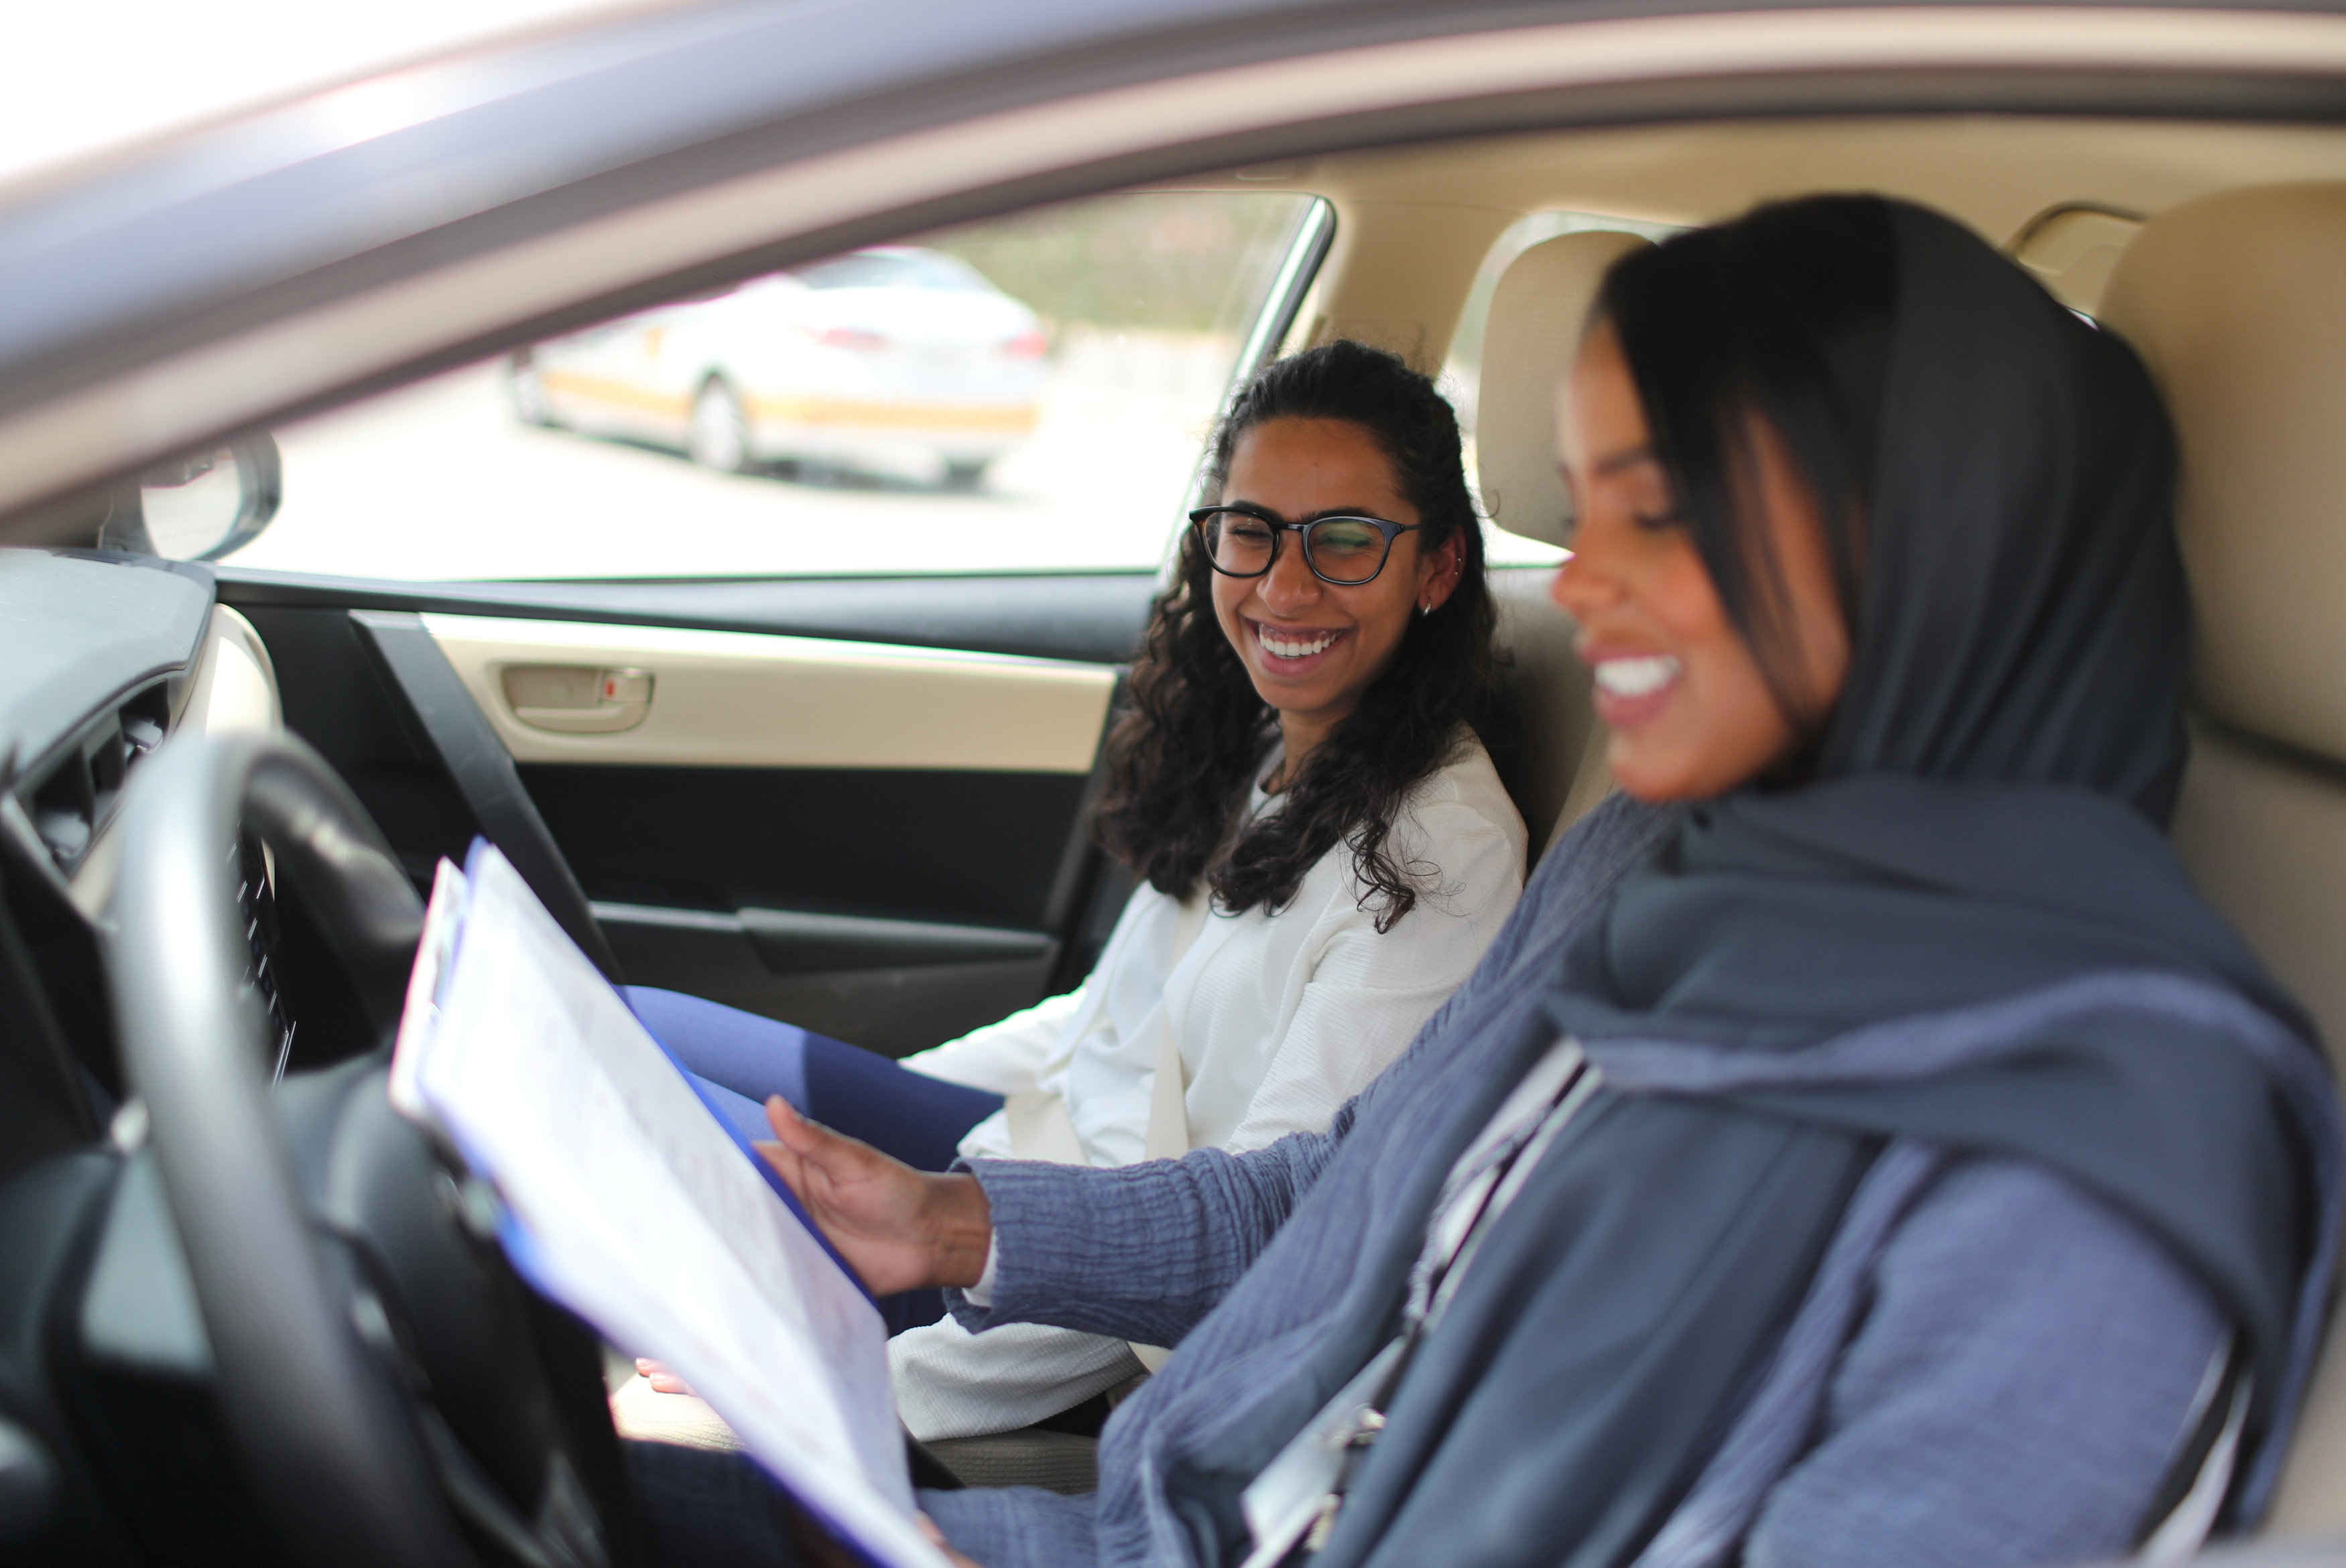 Driving instructor Ahlam al-Somali (R) reads instructions before getting ready to drive with trainee Maria al-Faraj at Saudi Aramco Driving Center in Dhahran, Saudi Arabia, June 6, 2018. REUTERS/Ahmed Jadallah